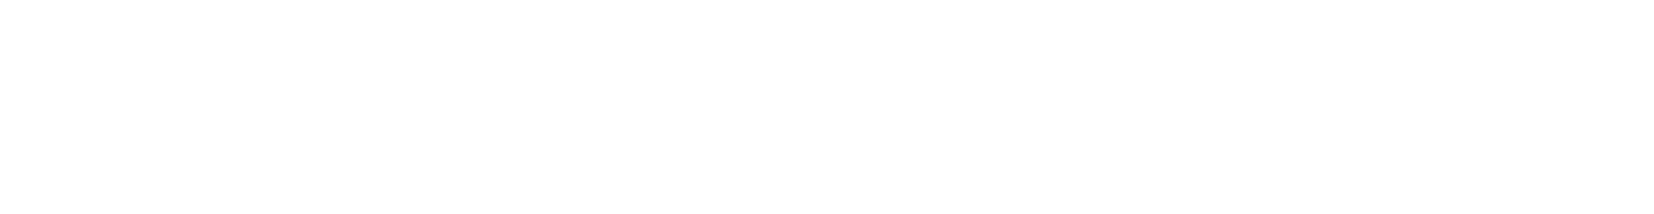 Opticalnet – Παπαβέργος – Οπτομέτρης – Οπτικά - Opticalnet – Παπαβέργος – Οπτομέτρης  Οπτικός – Γυαλιά οράσεως και ηλίου